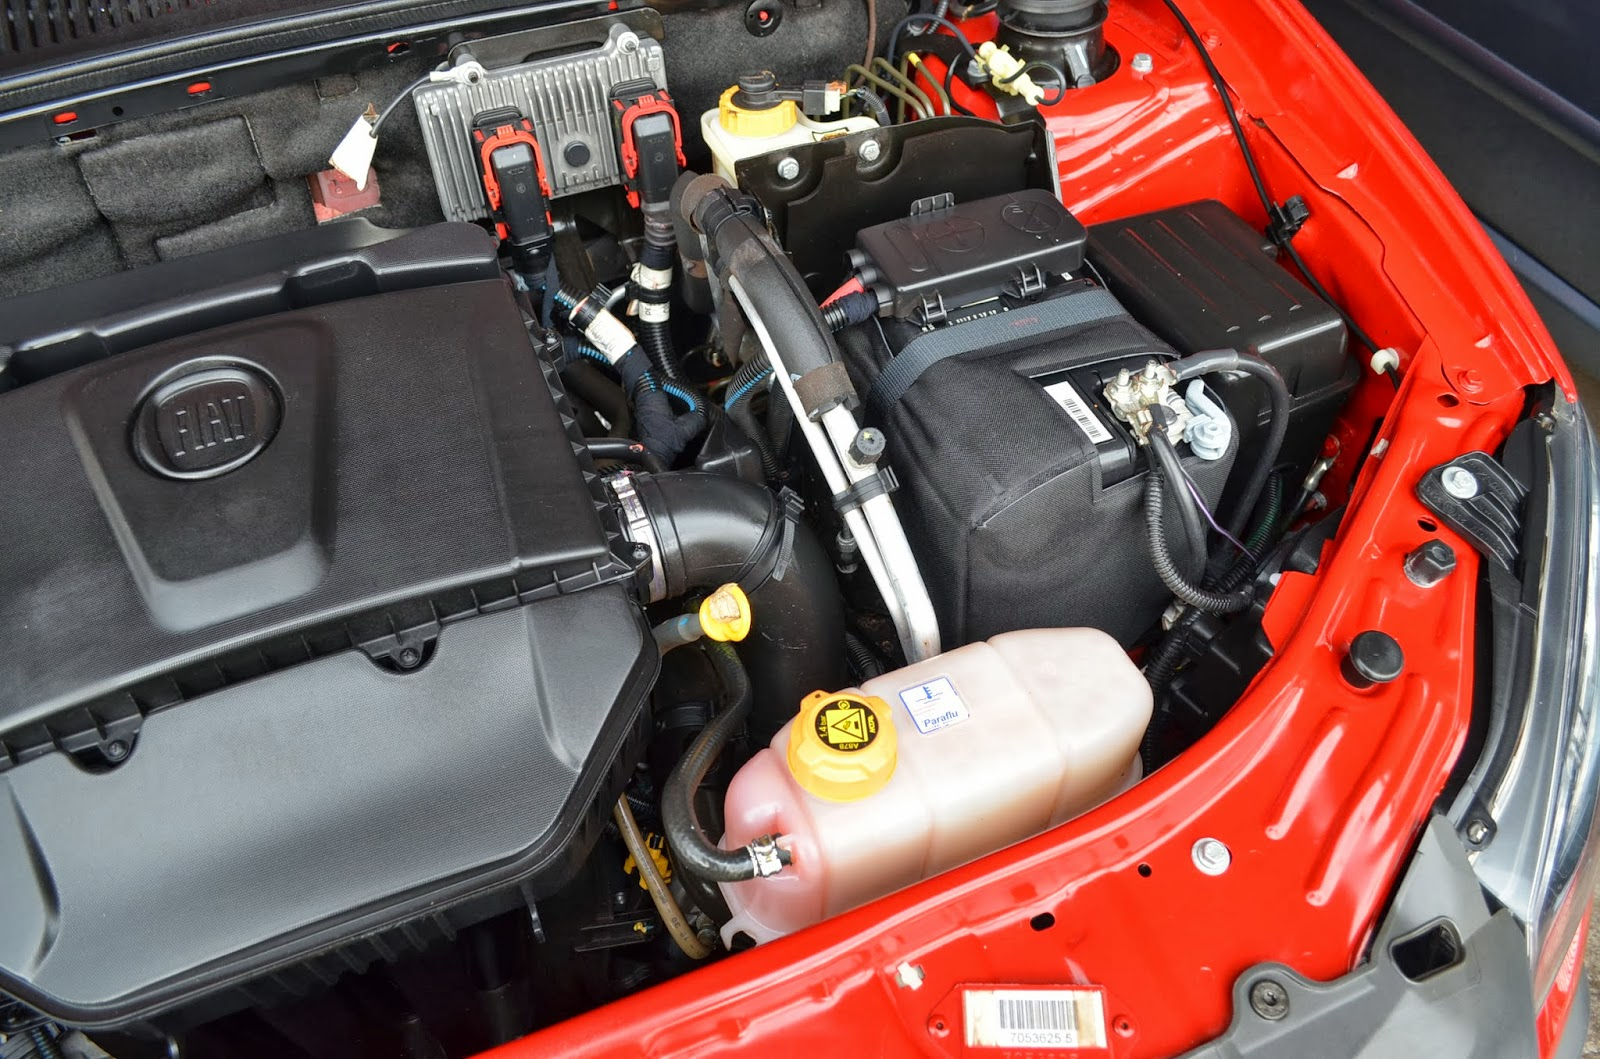 Beto autom veis 2011 fiat palio w adv locker 1 8 for Fiat palio adventure locker 2011 precio